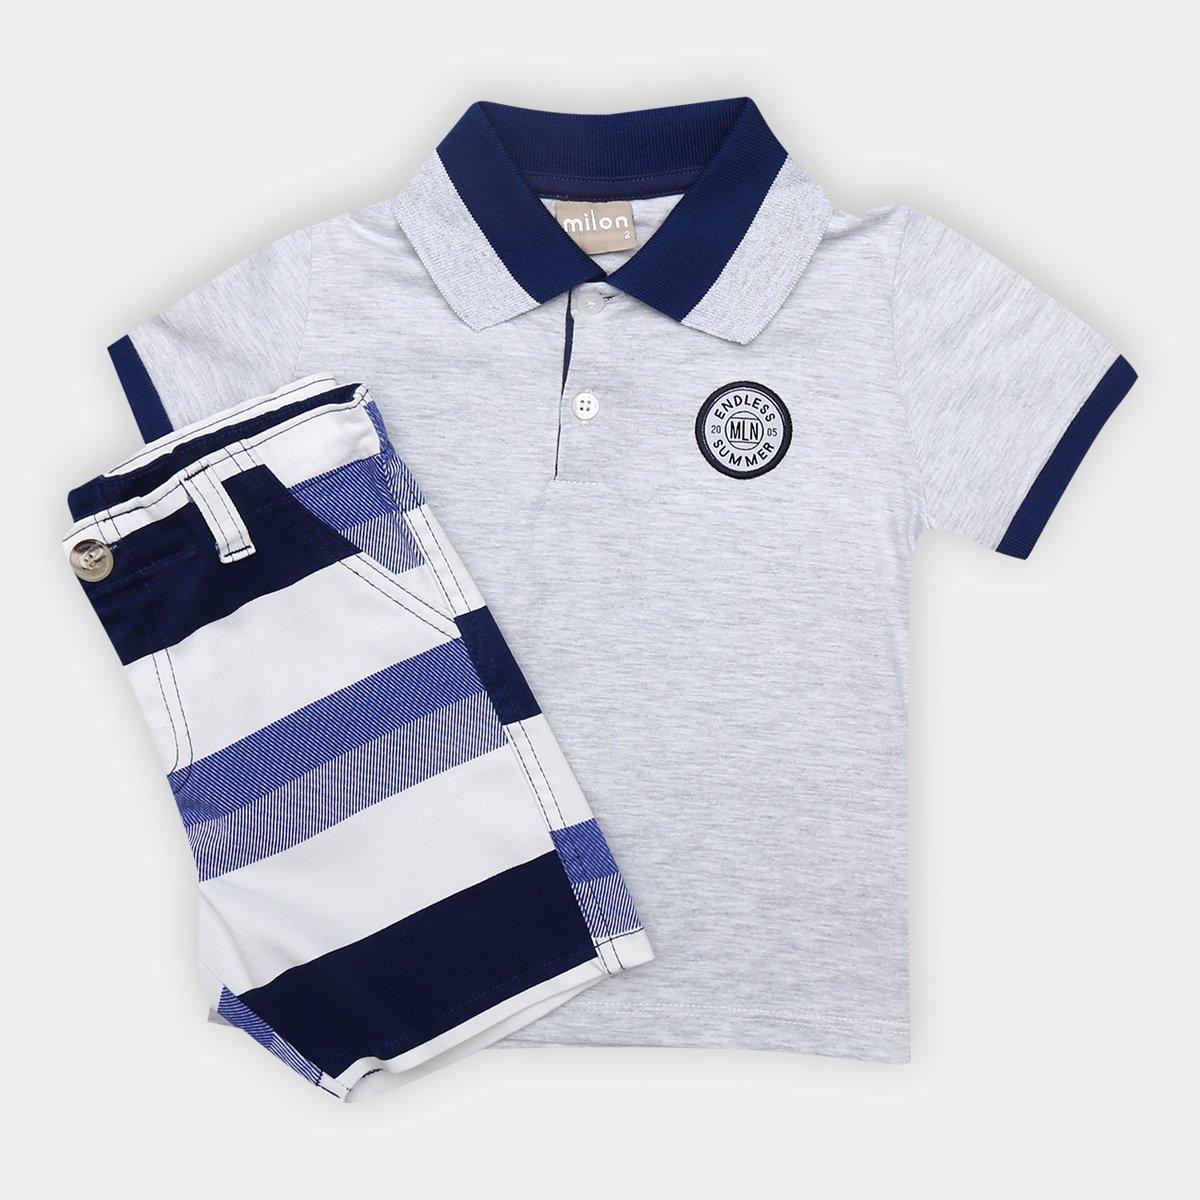 bf2c31a41a27d6 Conjunto de Camisa Polo + Bermuda Infantil Milon Masculino - Tam: 6A ...